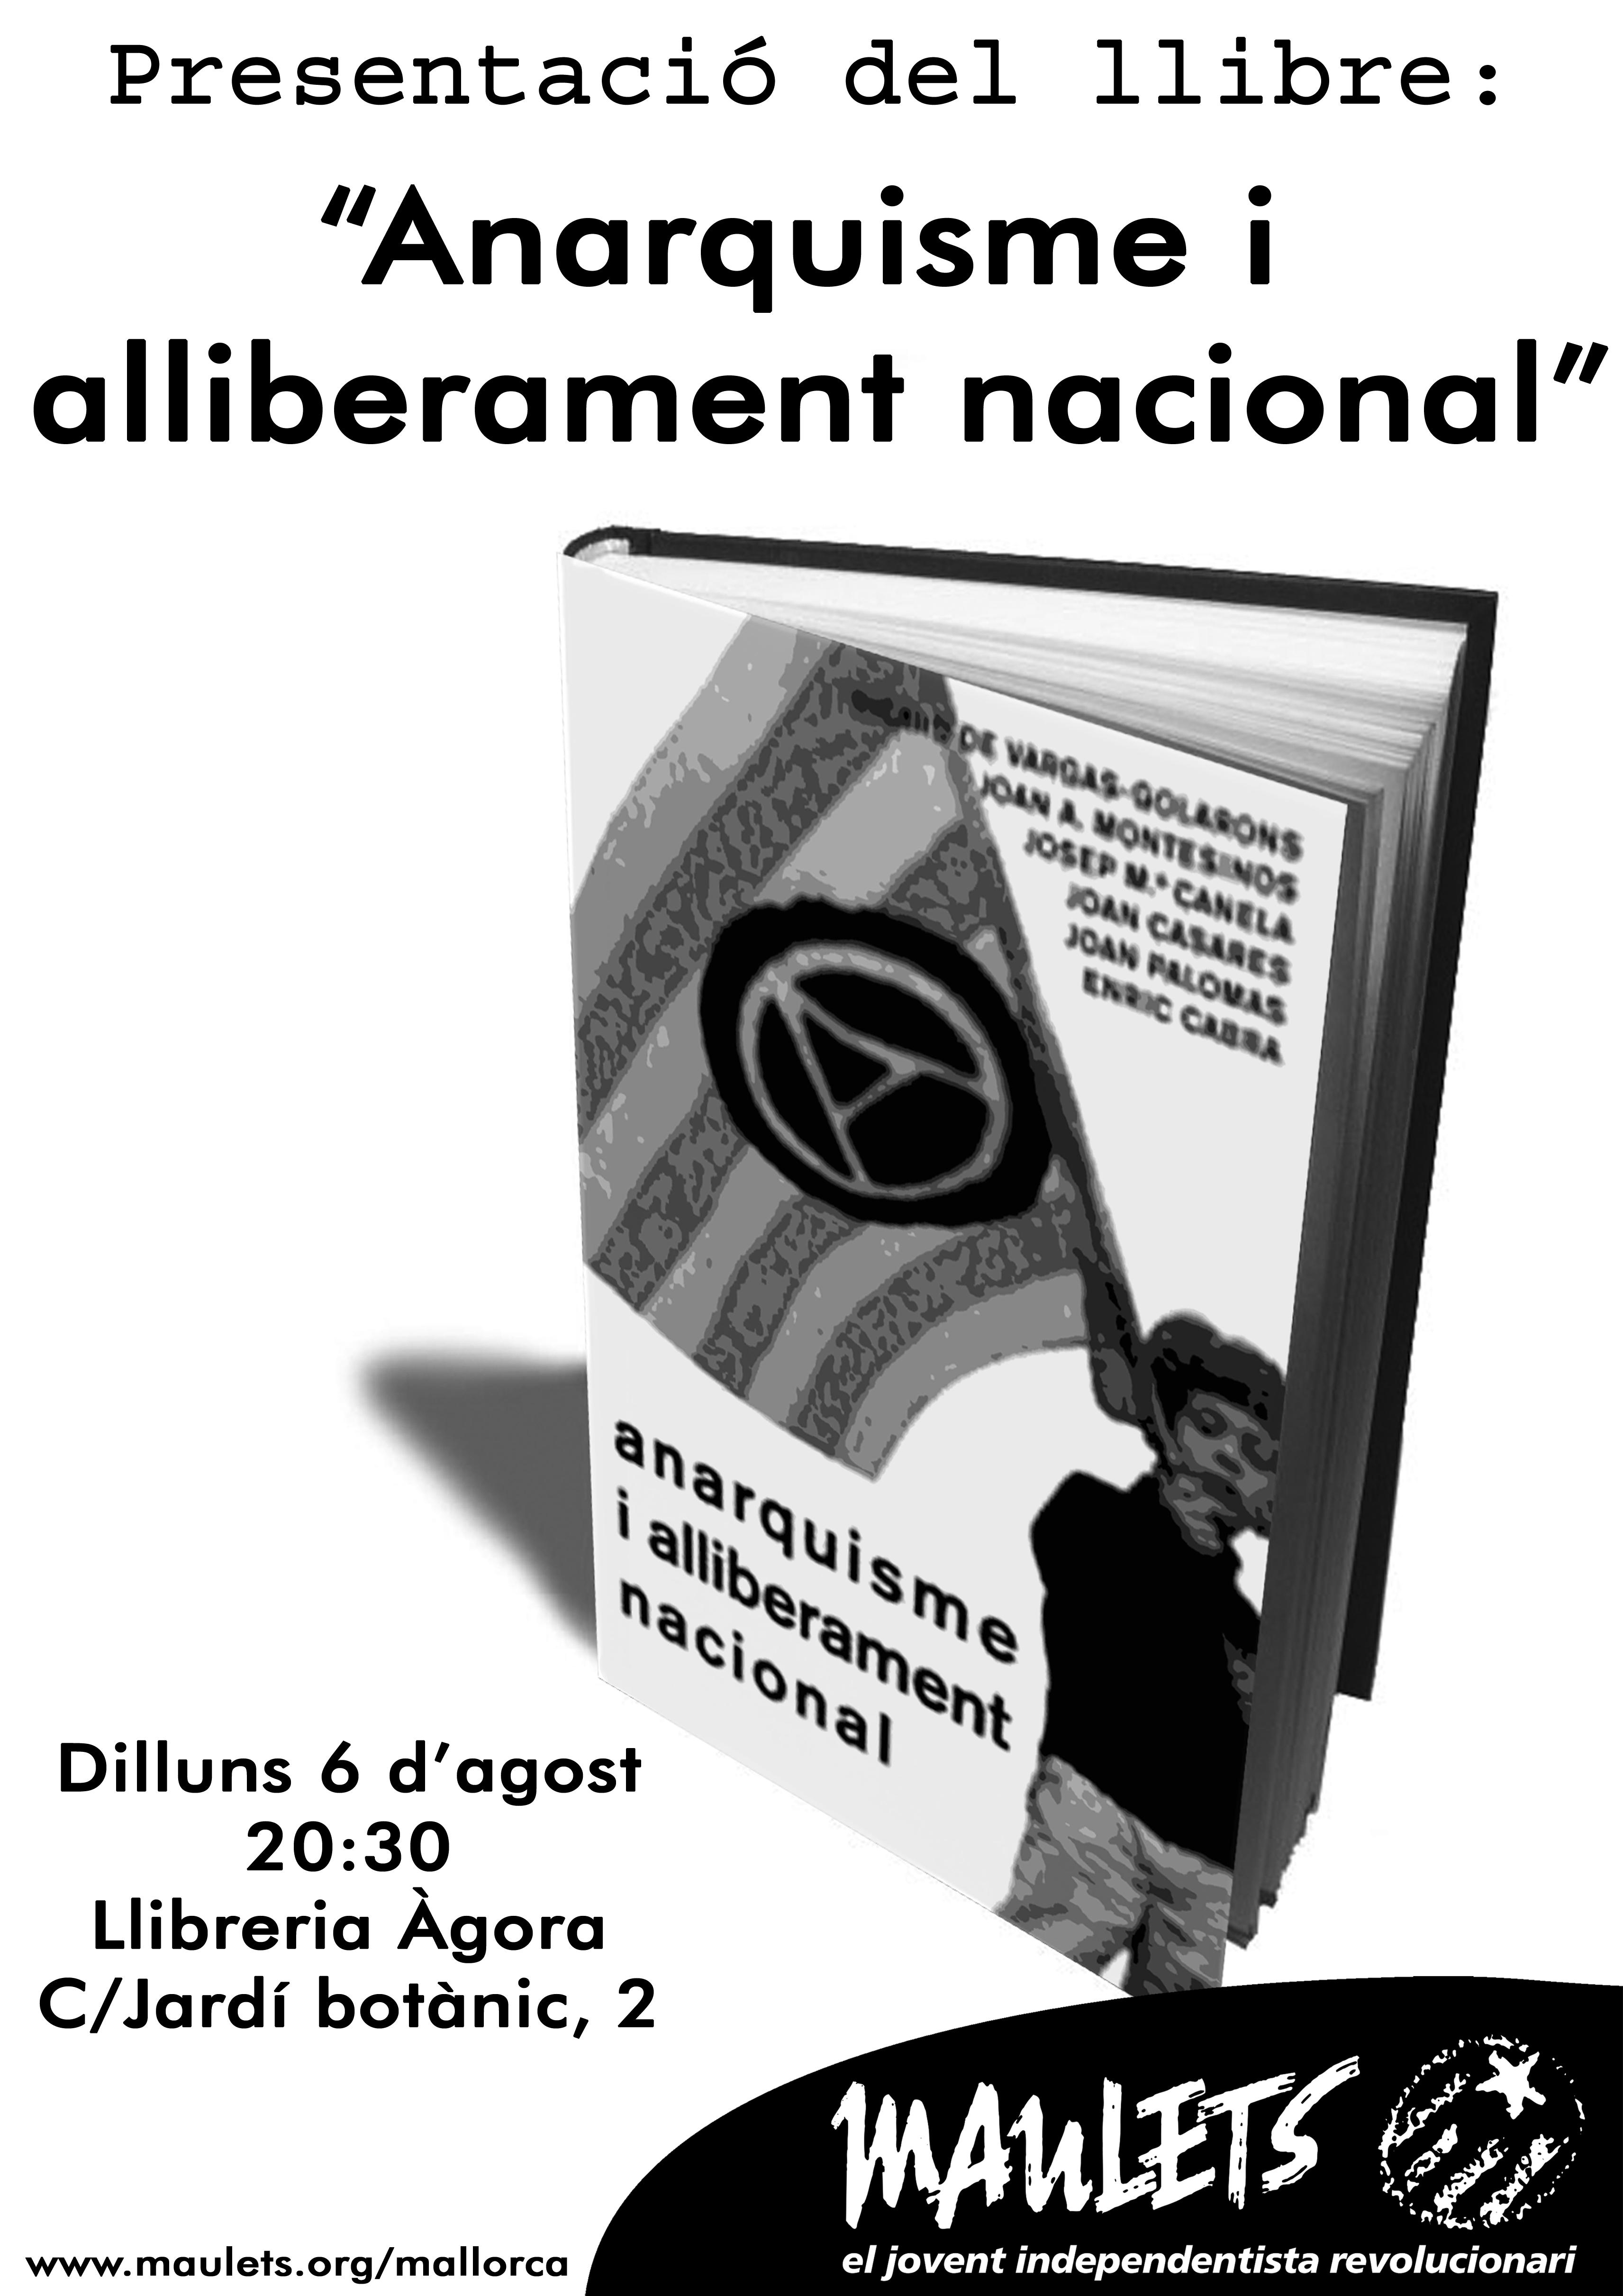 Anarquisme i alliberament nacional